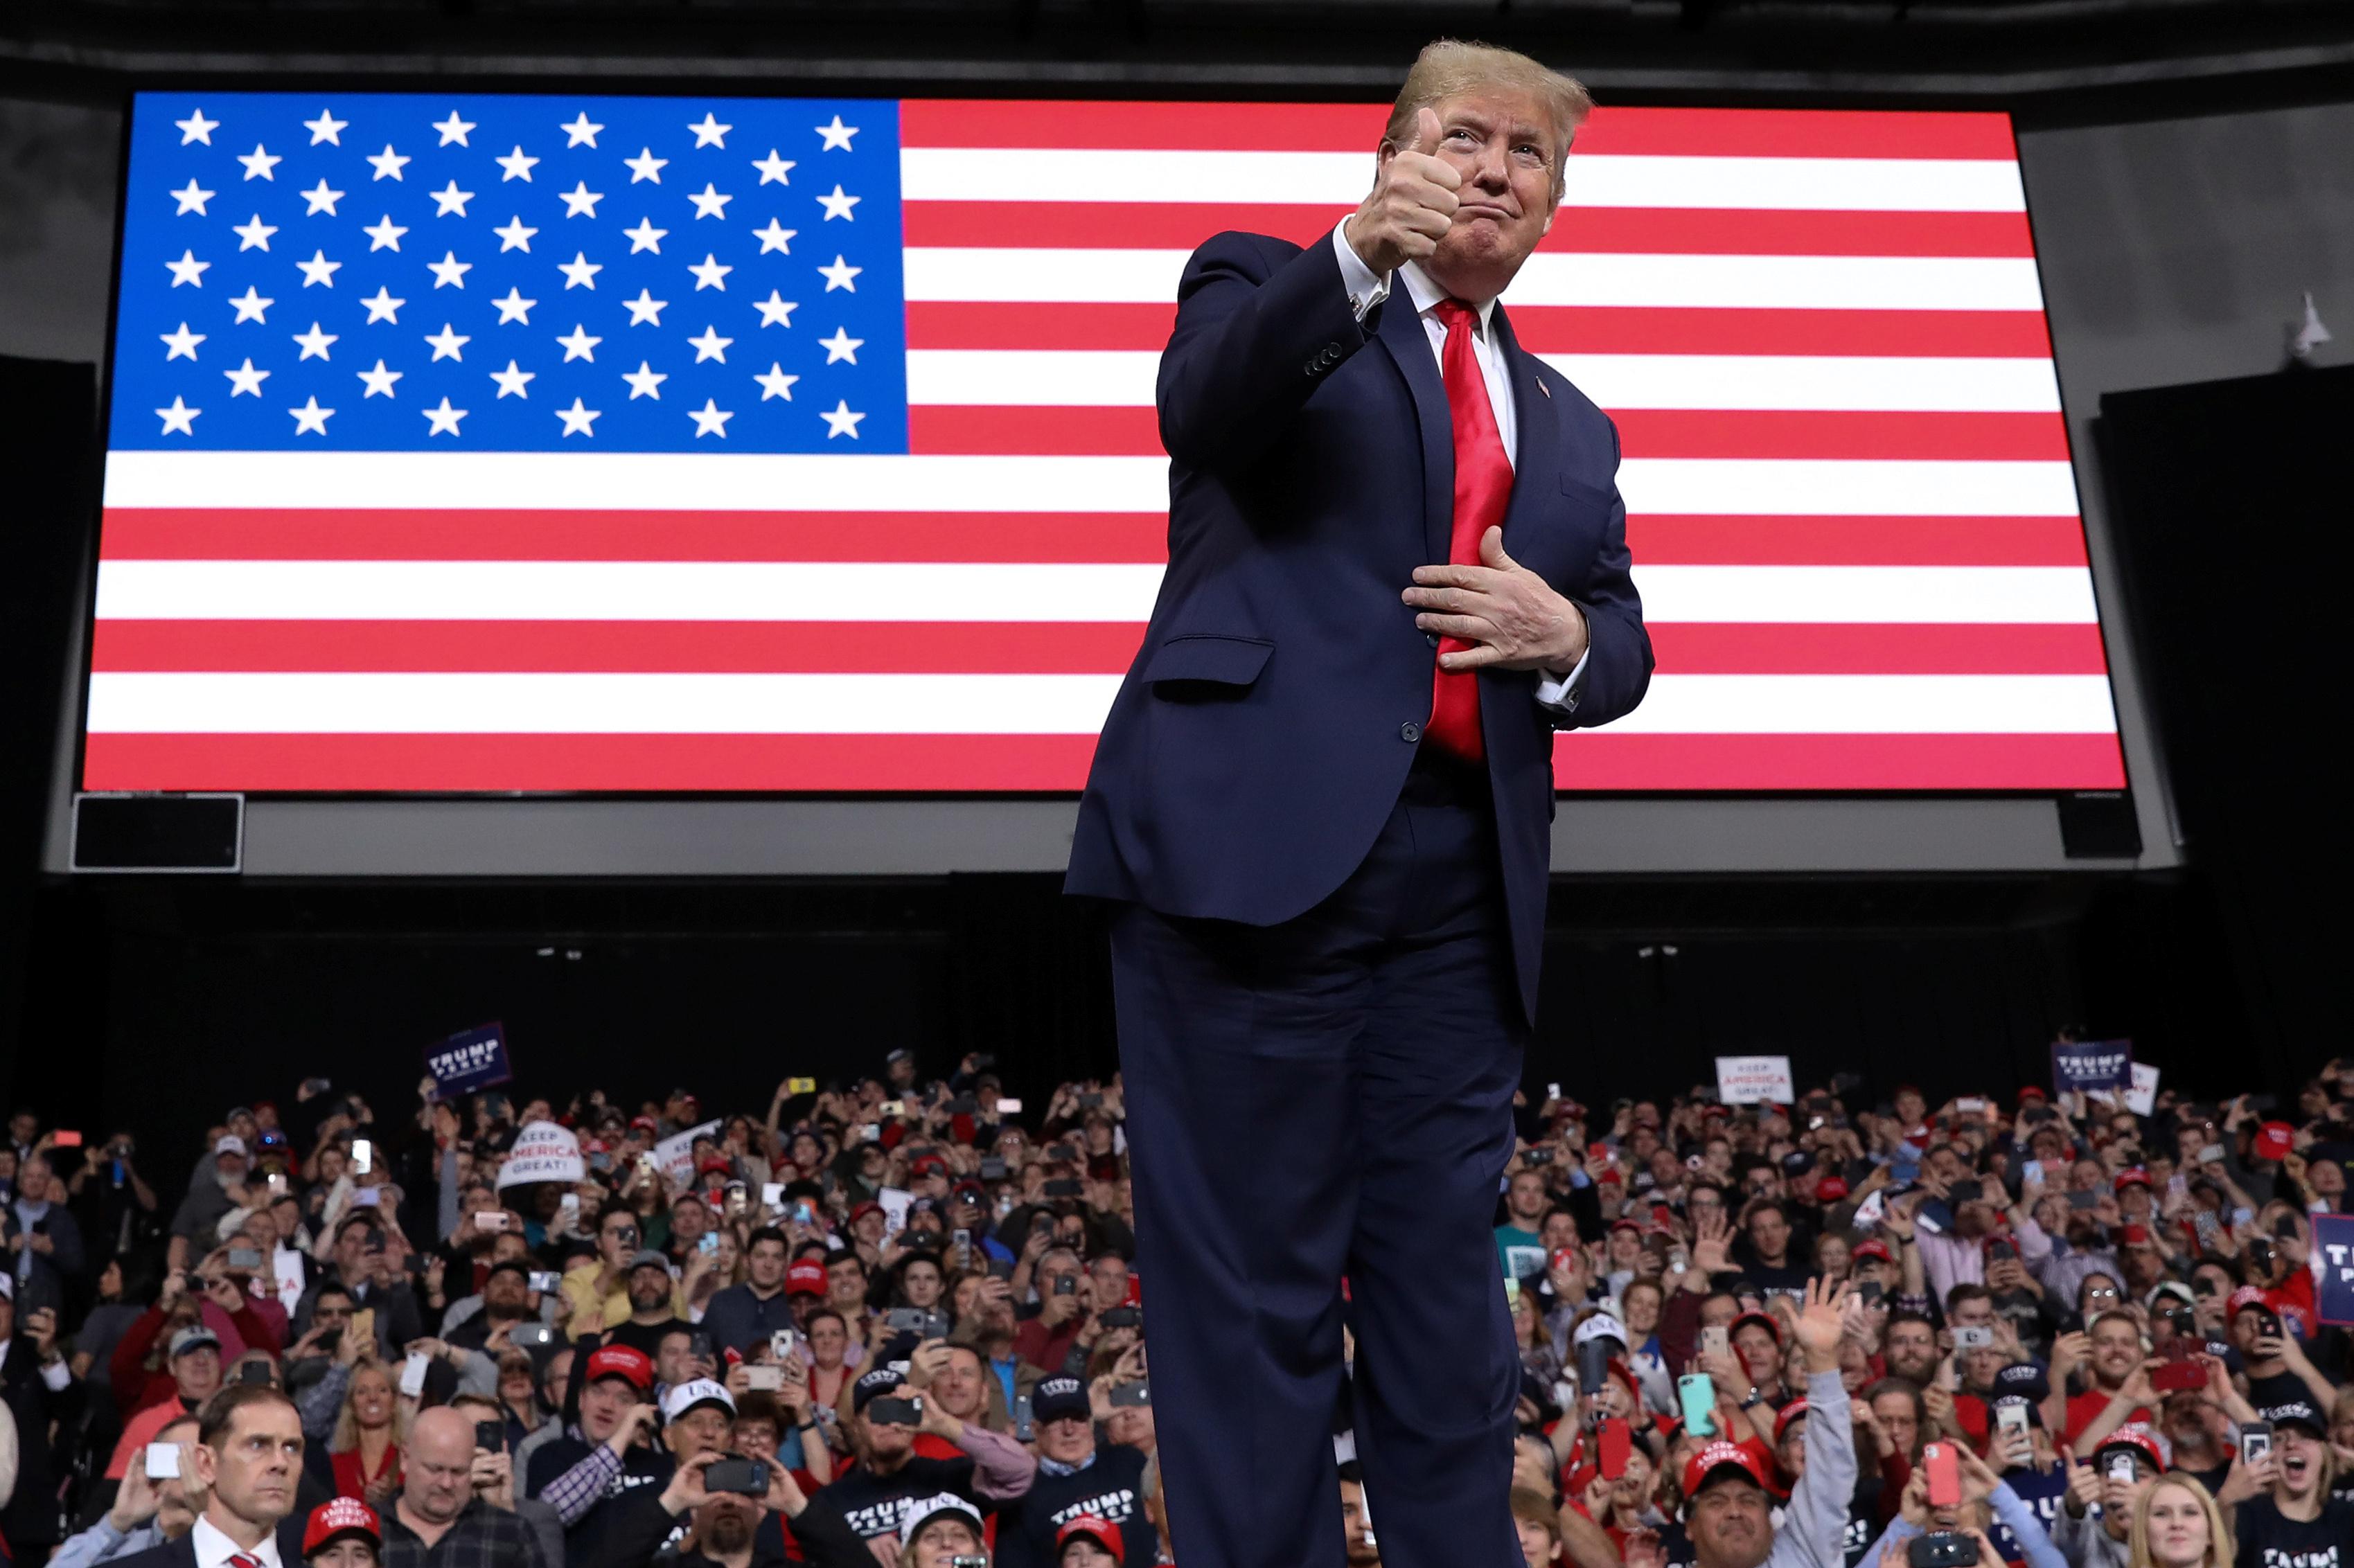 U.S. President Donald Trump rallies with supporters in Toledo, Ohio, U.S. Jan. 9, 2020. REUTERS/Jonathan Ernst